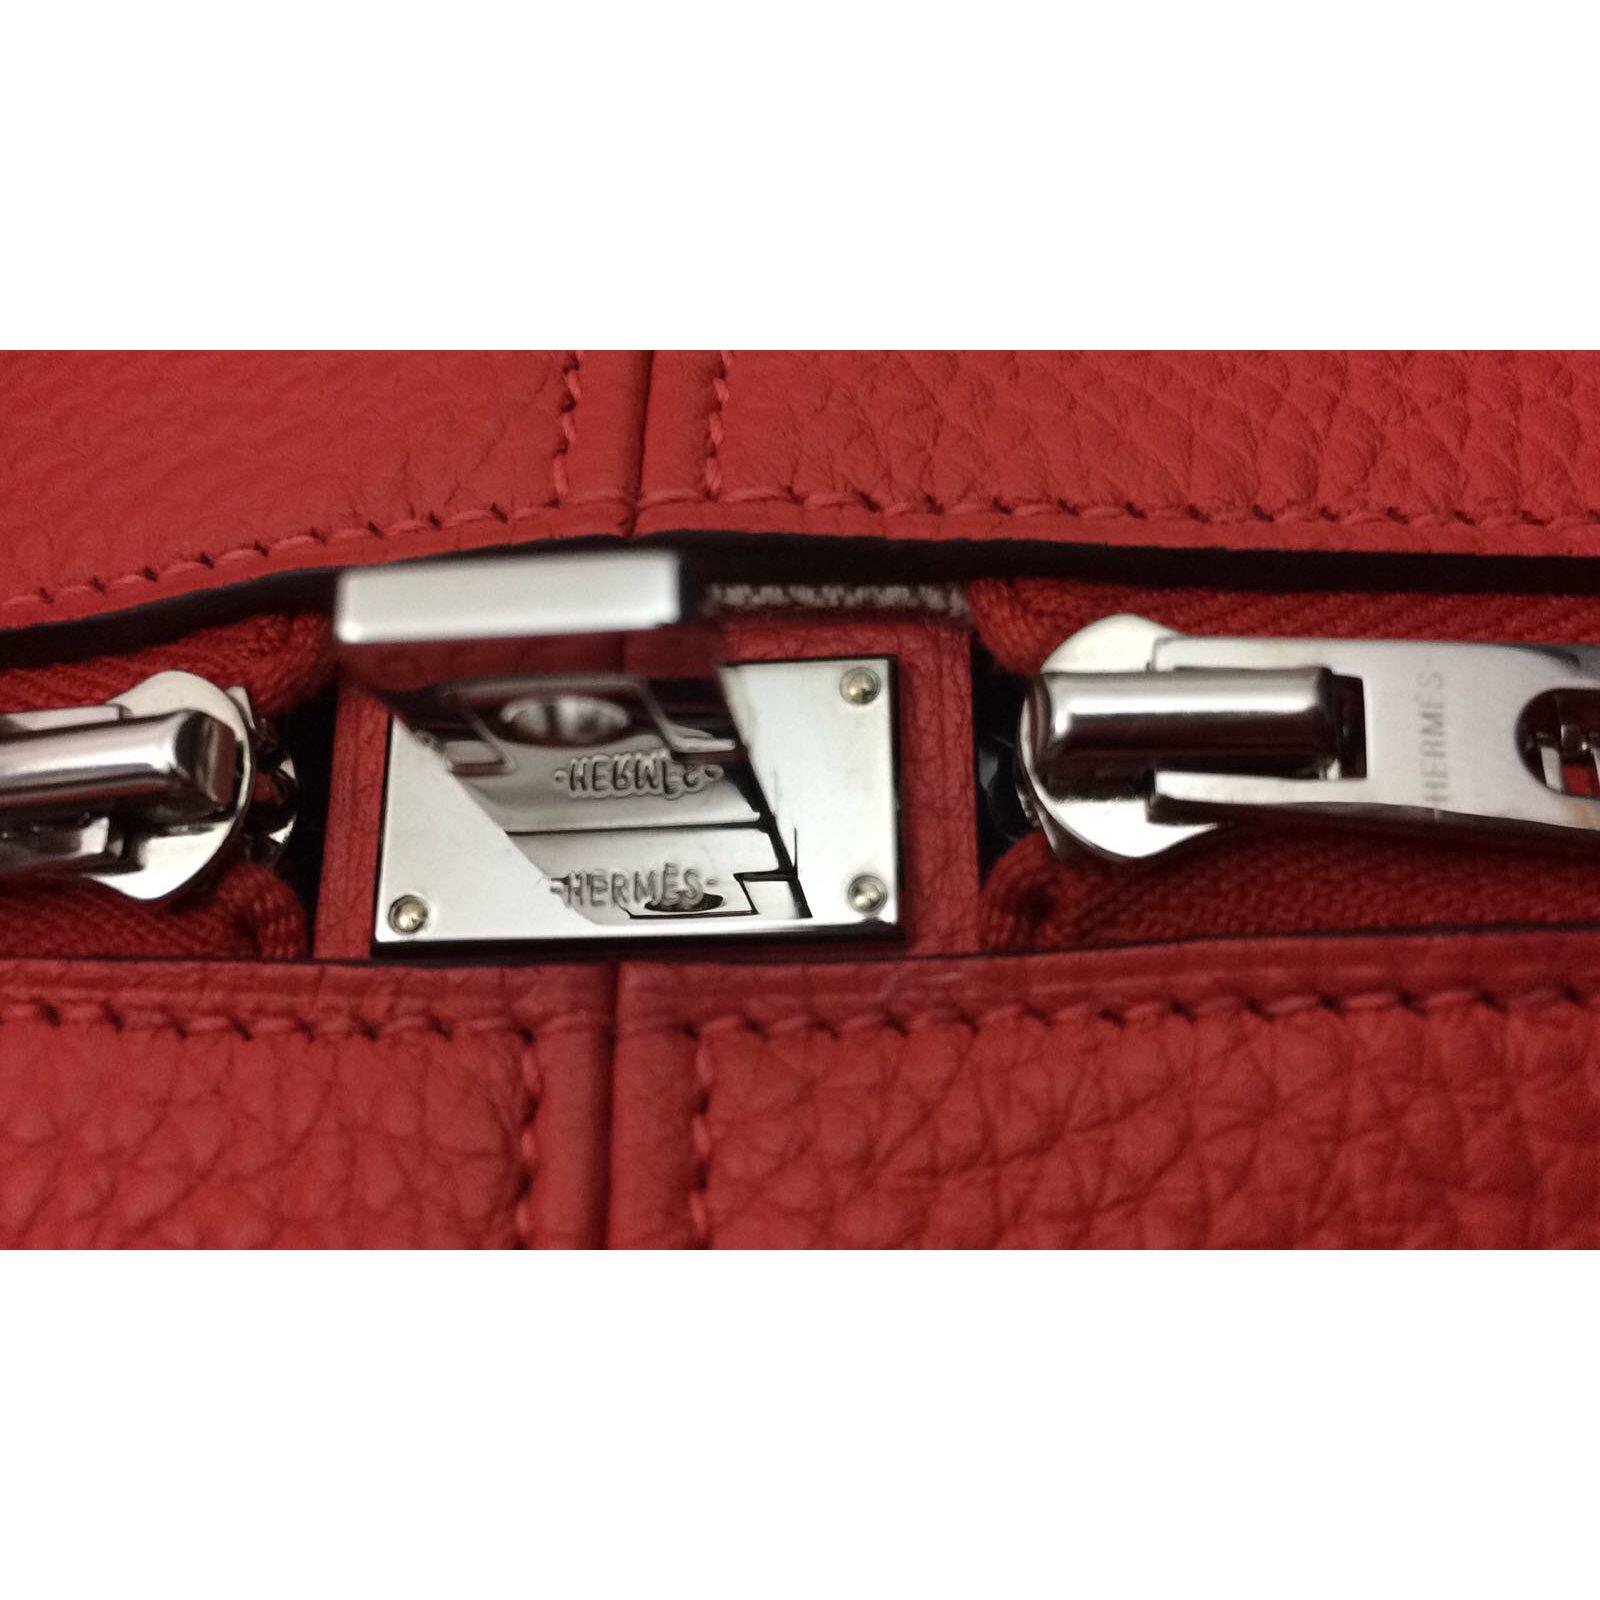 2a0fa50481 Sacs à main Hermès Sac Hermès Victoria II en rouge pivoine, état neuf !  Cuir Rouge ref.41754 - Joli Closet